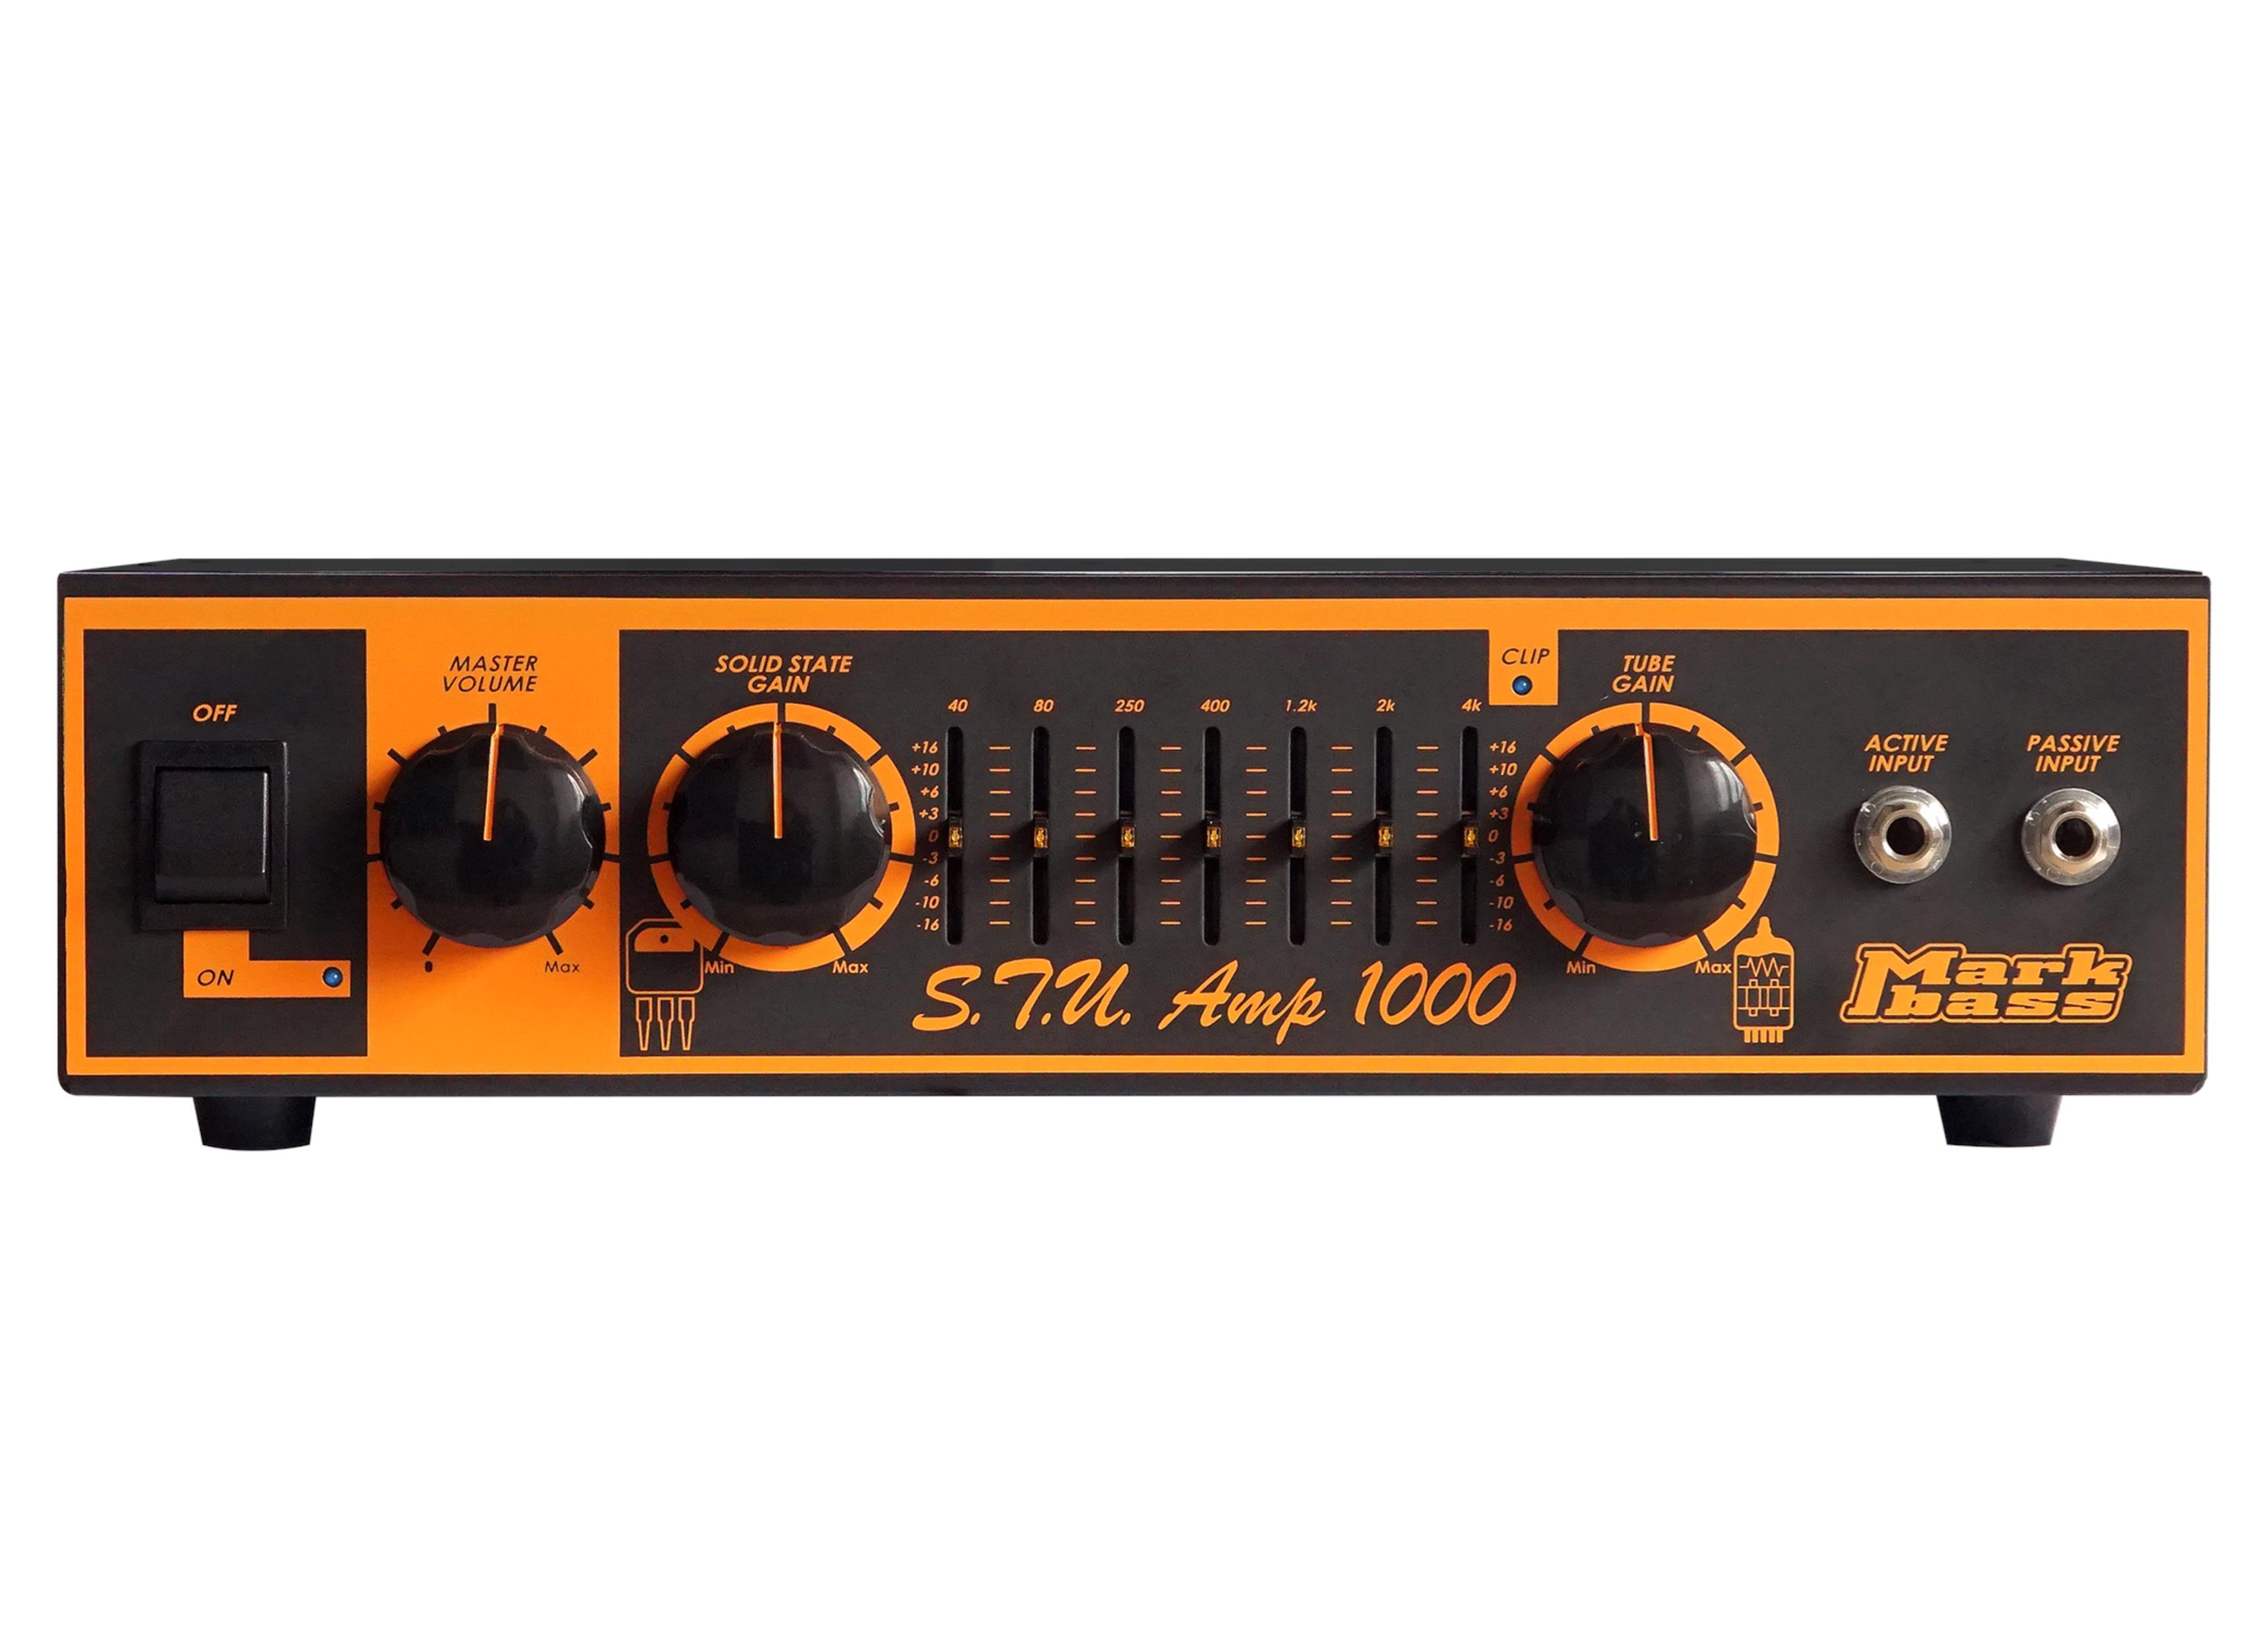 MARKBASS STU AMP 1000 STUART HAMM